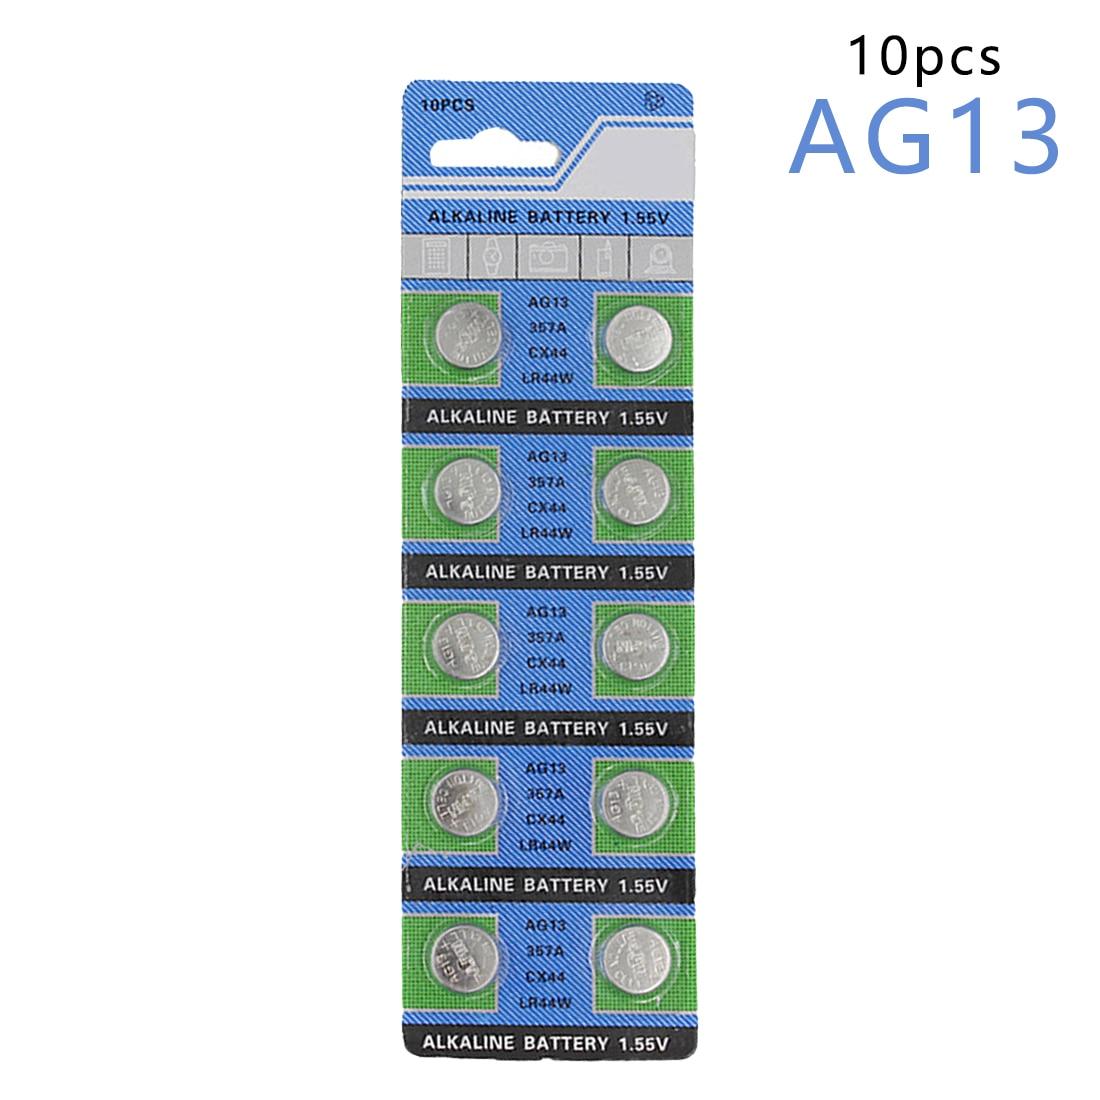 цена на centechia Hot Sale 10 Pcs AG13 LR44 357A S76E G13 Button Coin Cell Battery Batteries 1.55V Alkaline